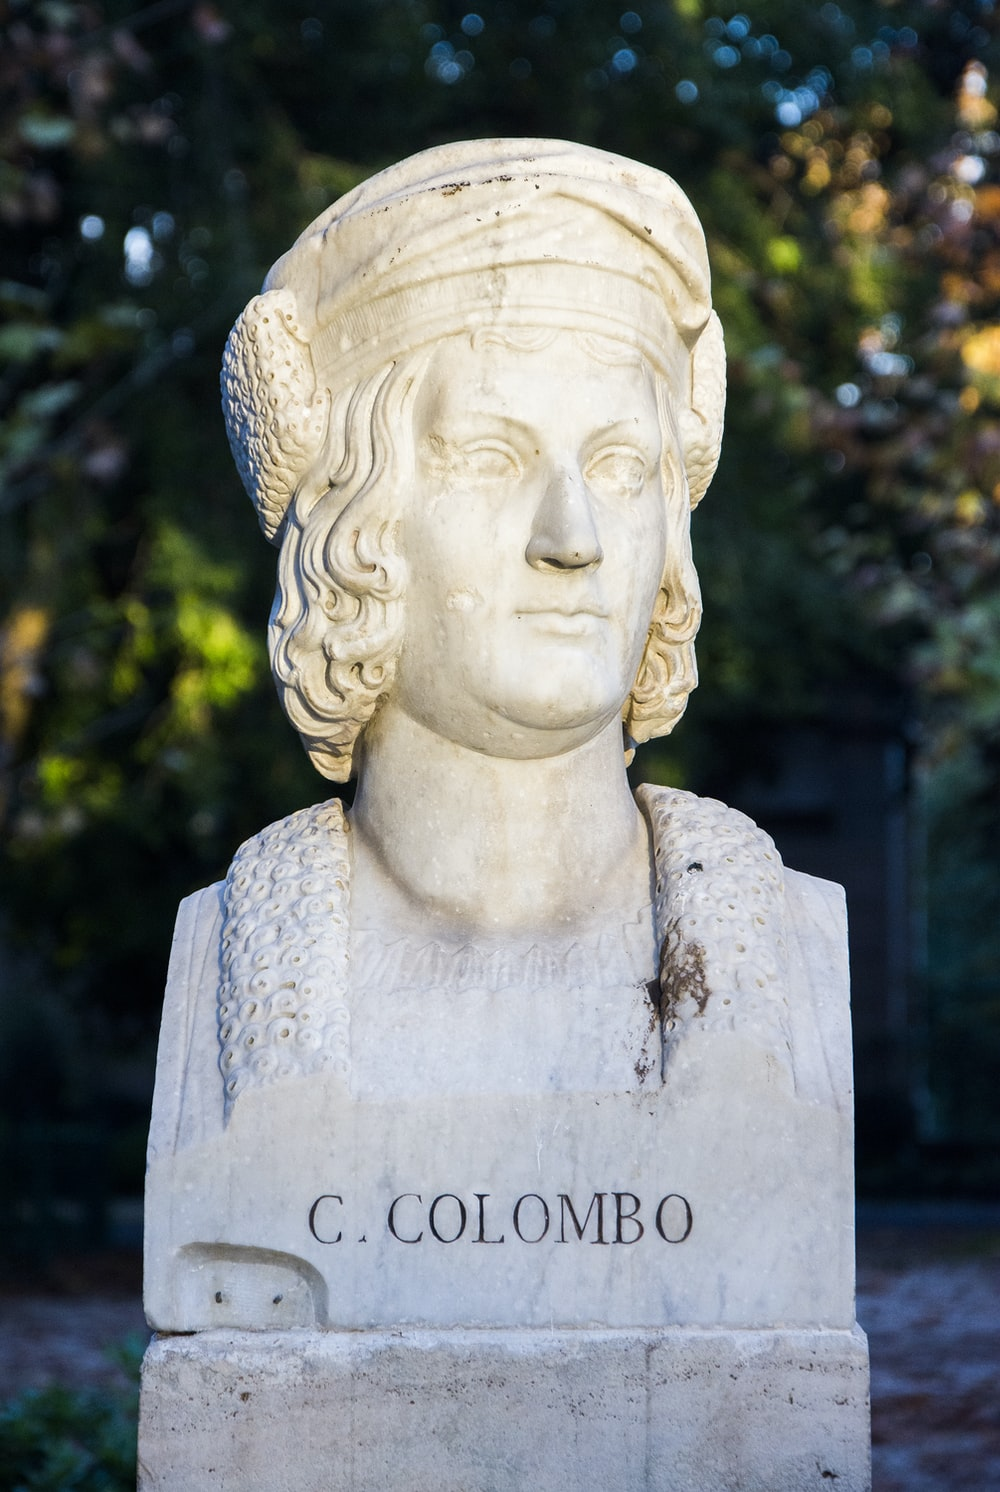 C. Colombo head bust